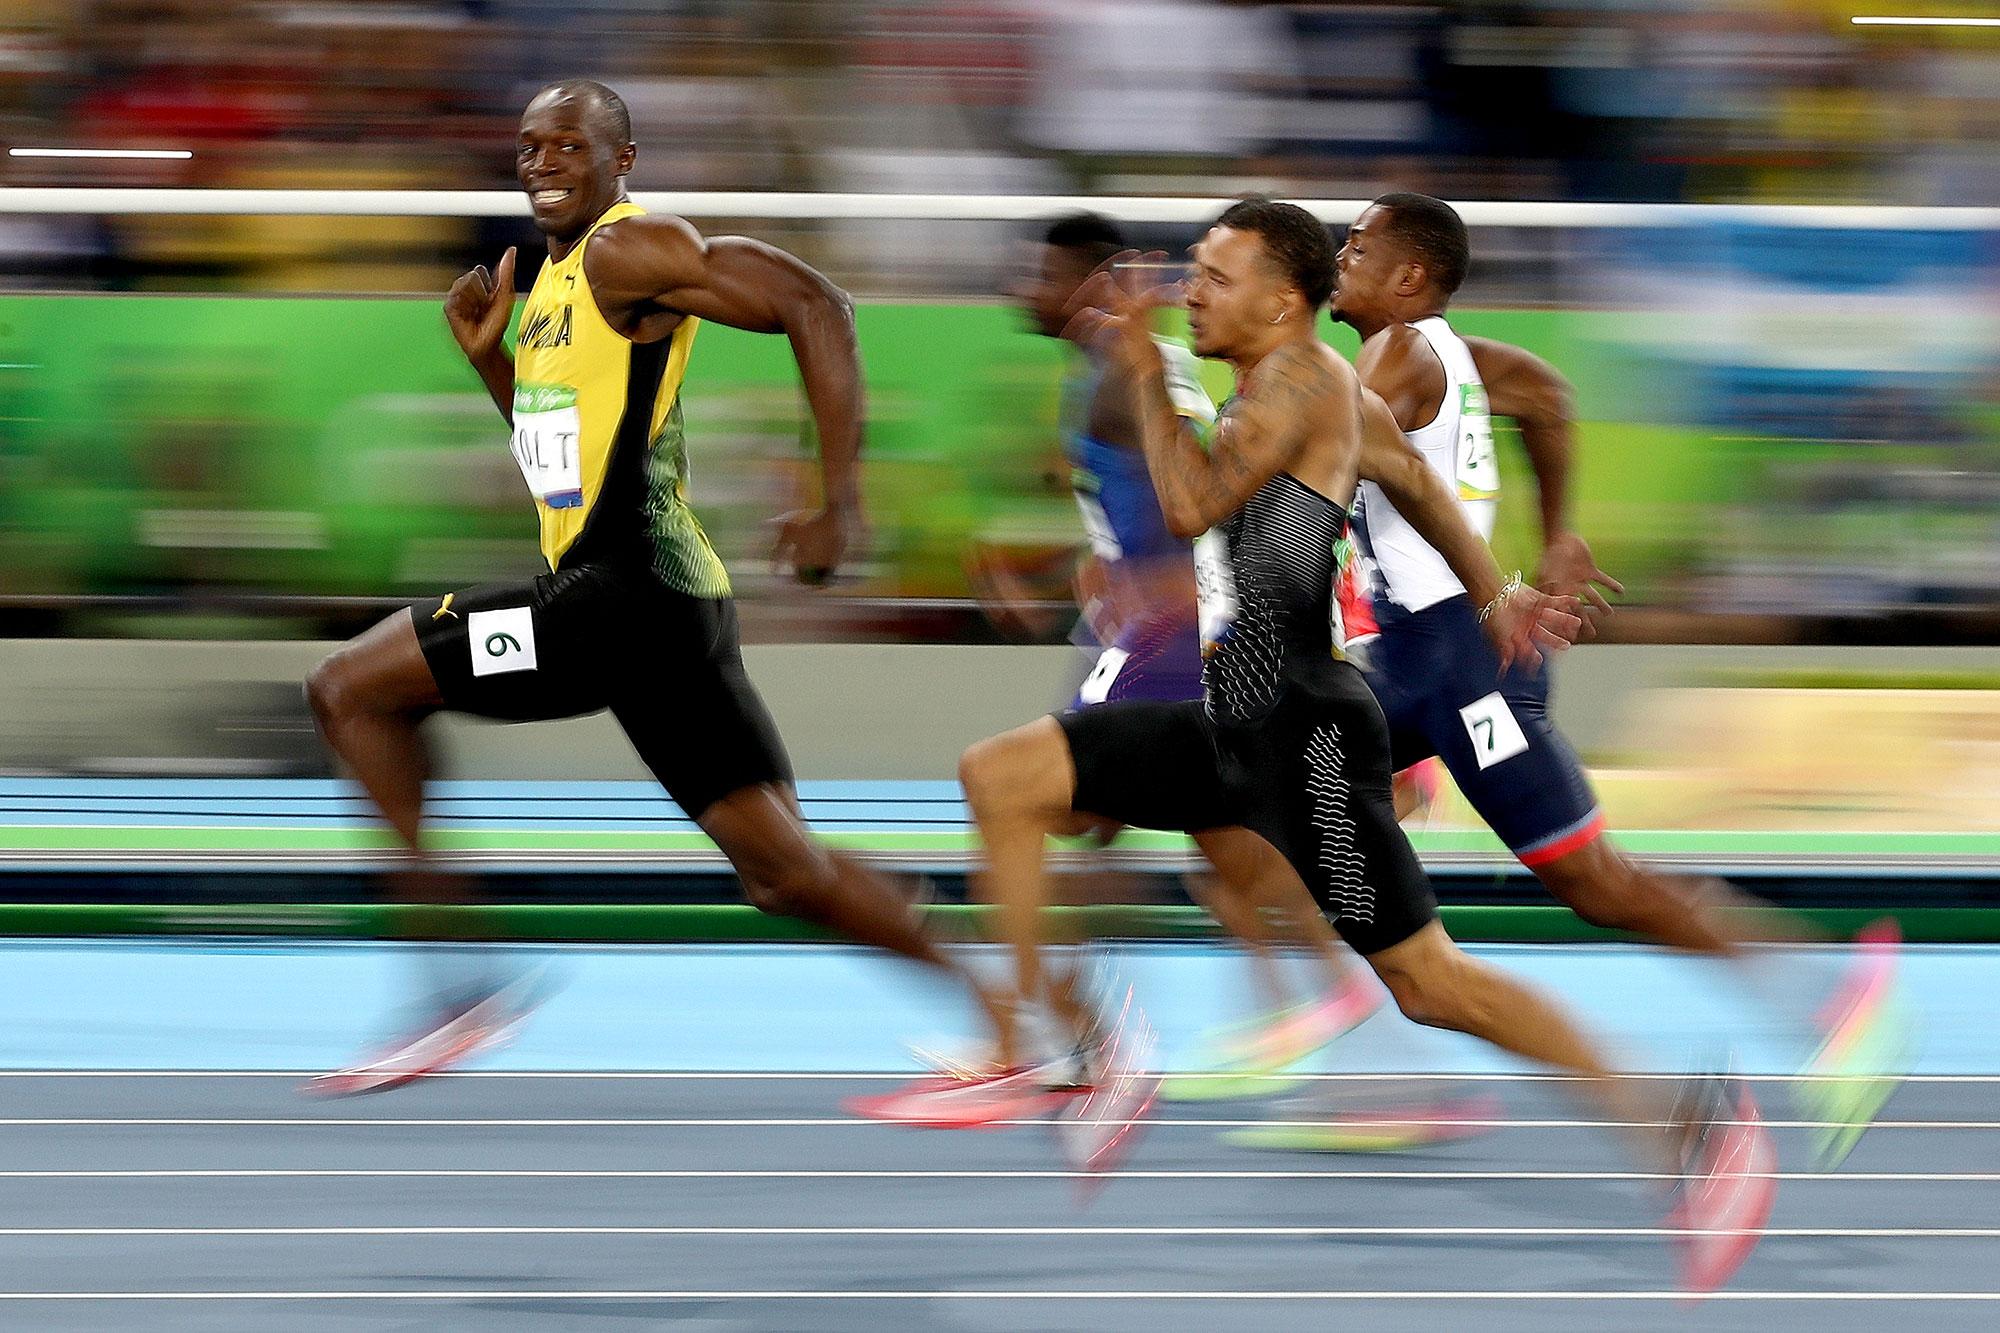 Ellen DeGeneres S Meme Of Usain Bolt Accused Of Being Racist